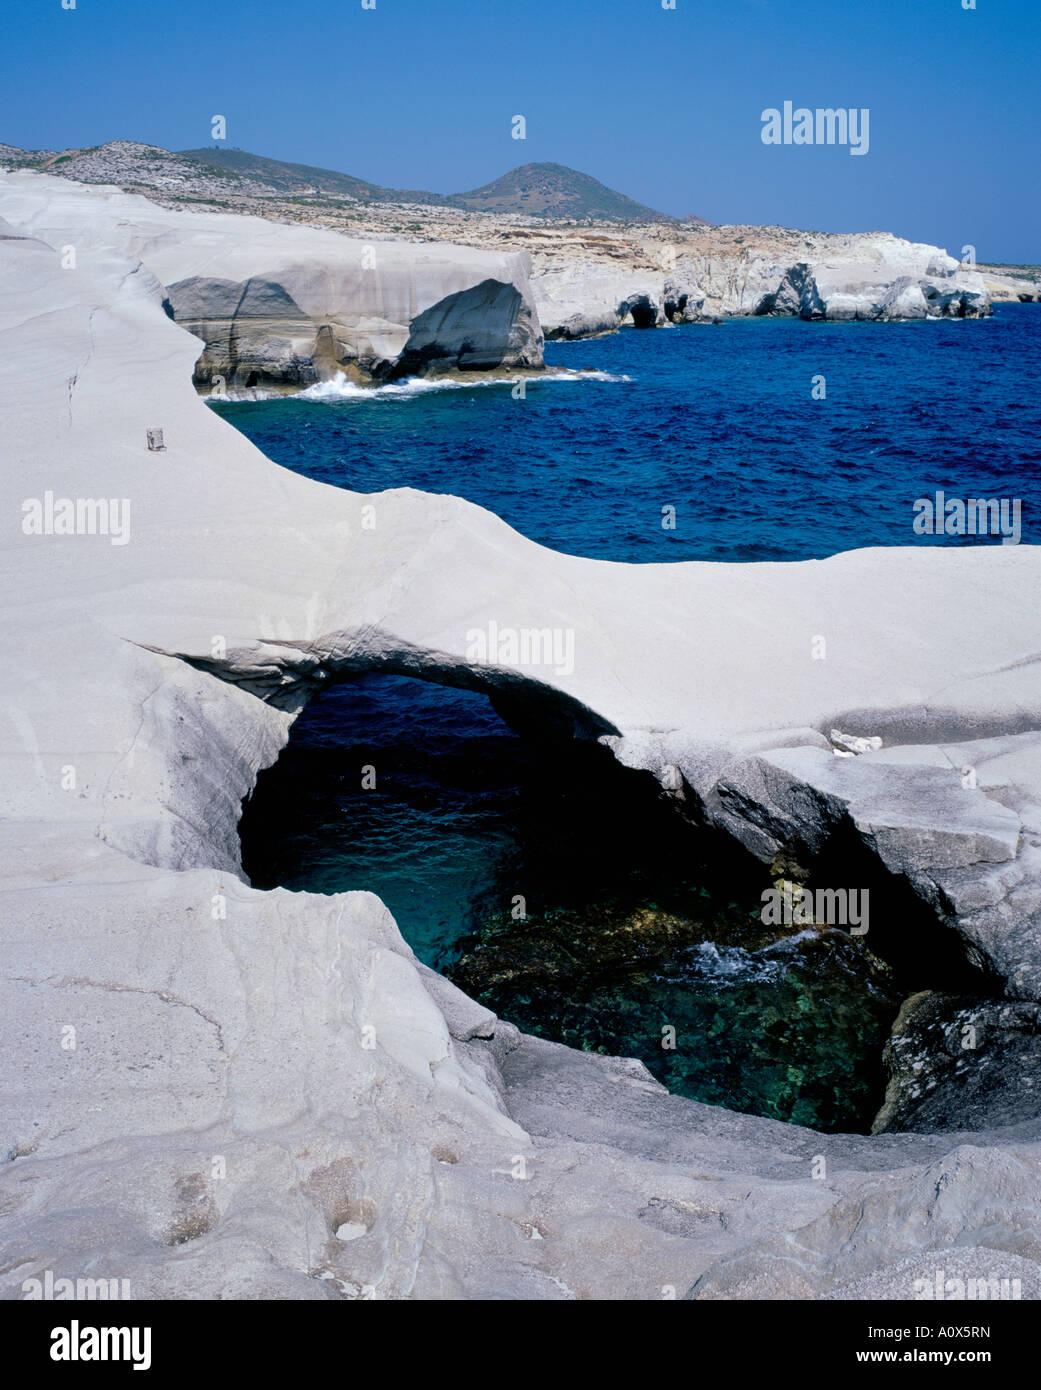 Volcanic rock formations on the coast Sarakiniko Milos Cyclades Islands Greek Islands Greece Europe - Stock Image